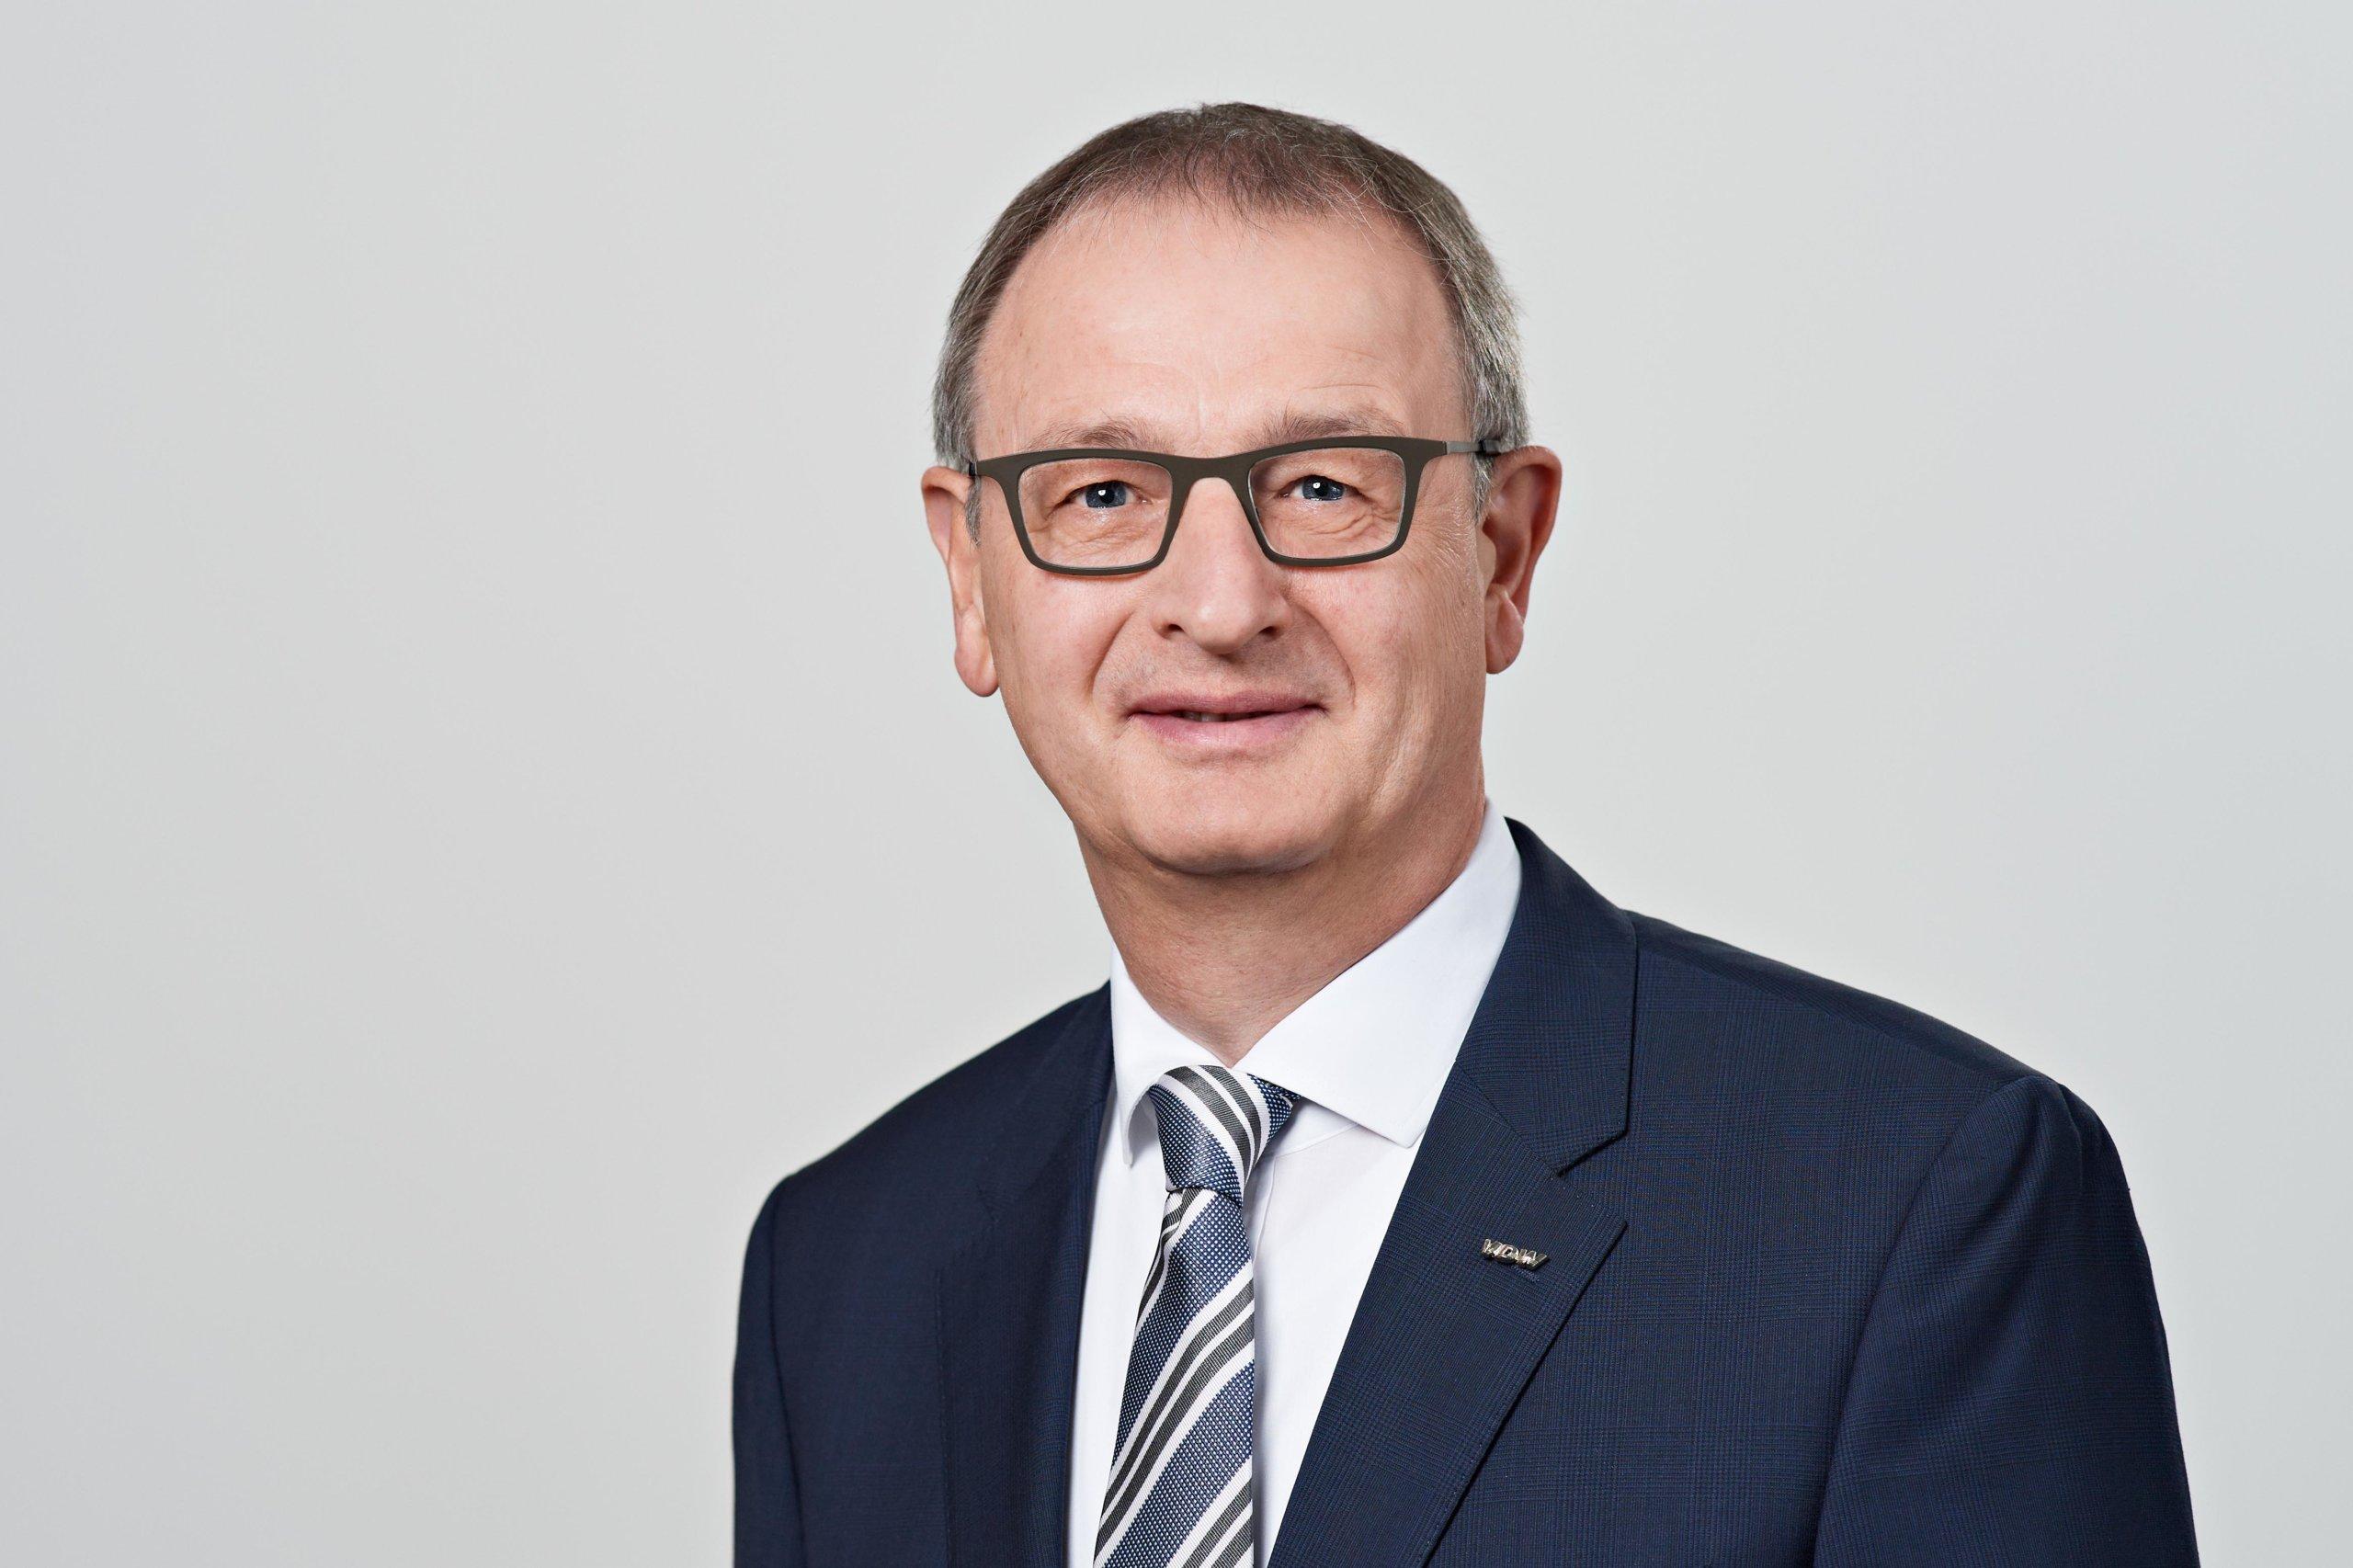 Dr. Wilfried Schäfer, Executive Director VDW (German Machine Tool Builders' Association)